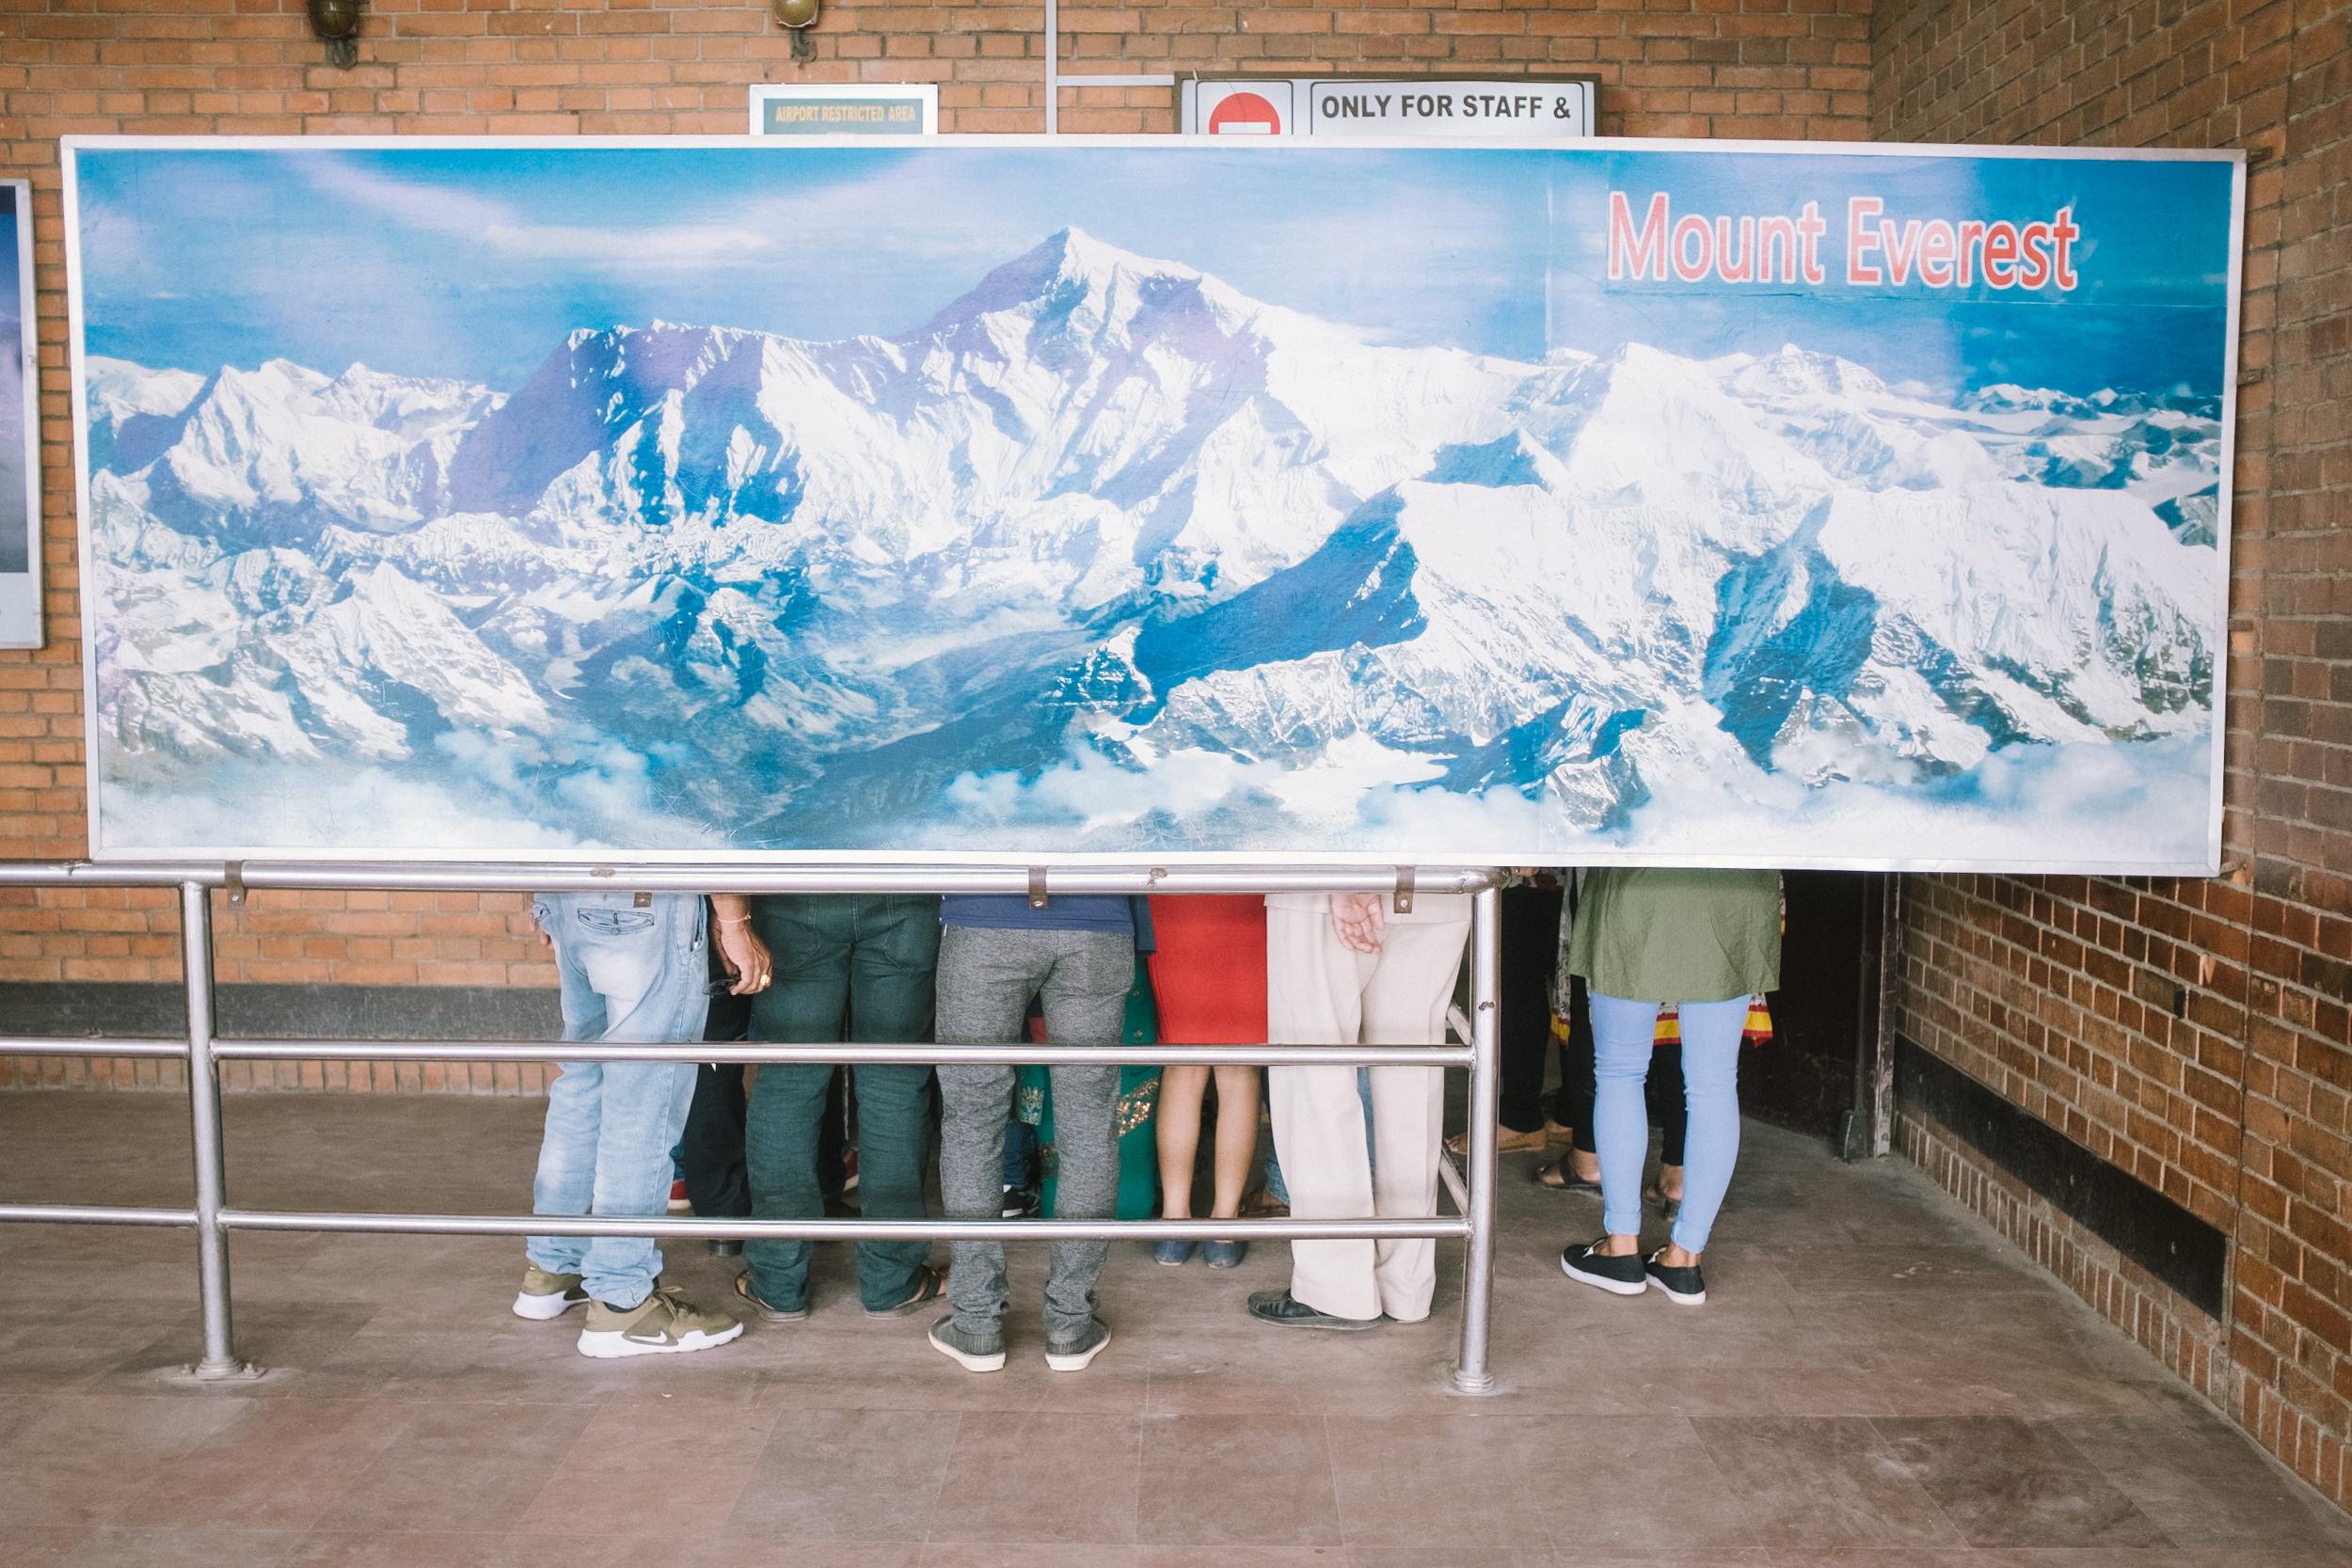 Copy of Lot 597 Mt. Everest - Photograph